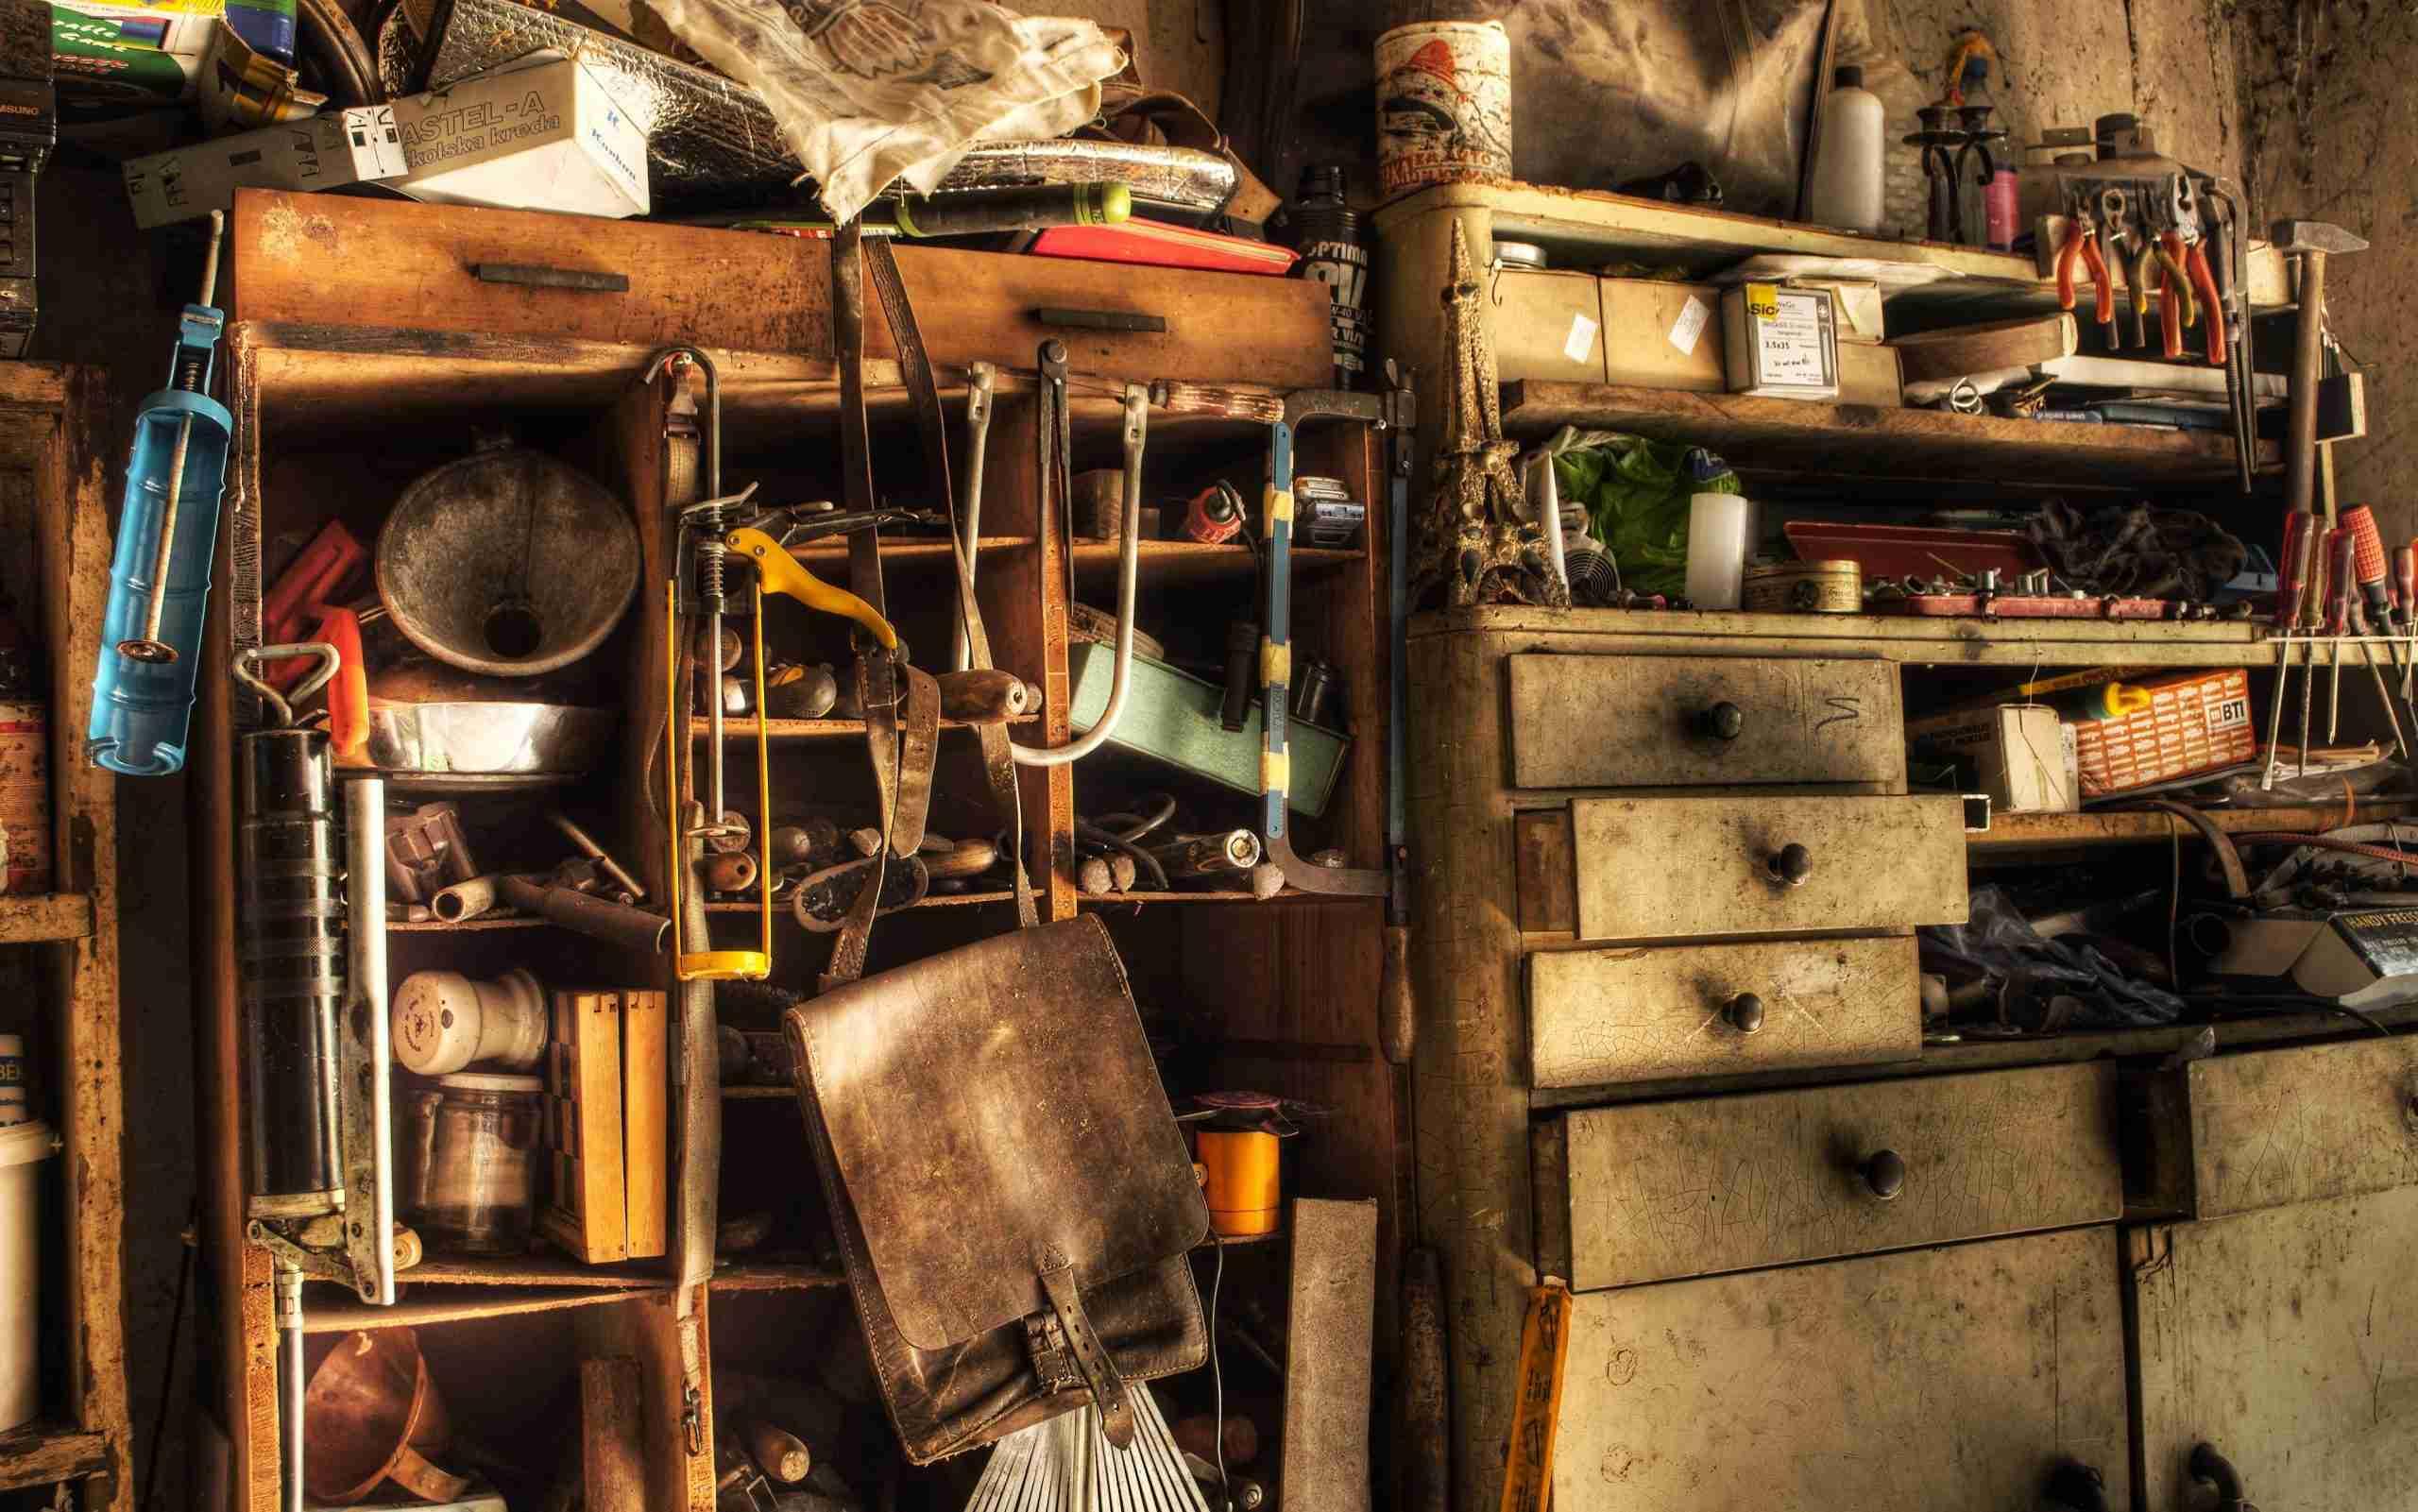 junk removal services organization